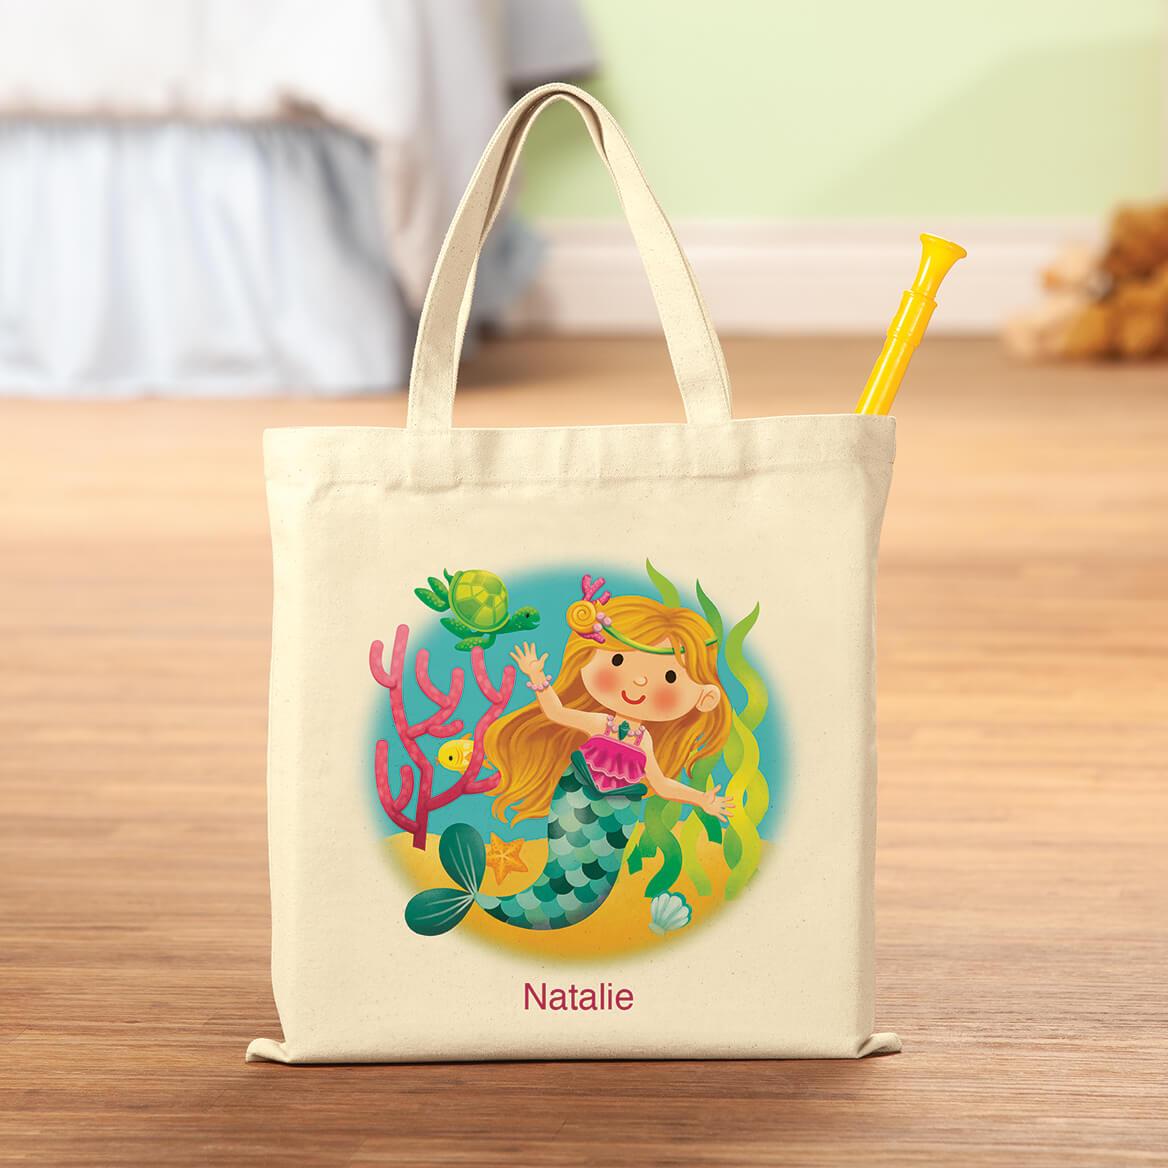 Personalized Mermaid Tote-369512